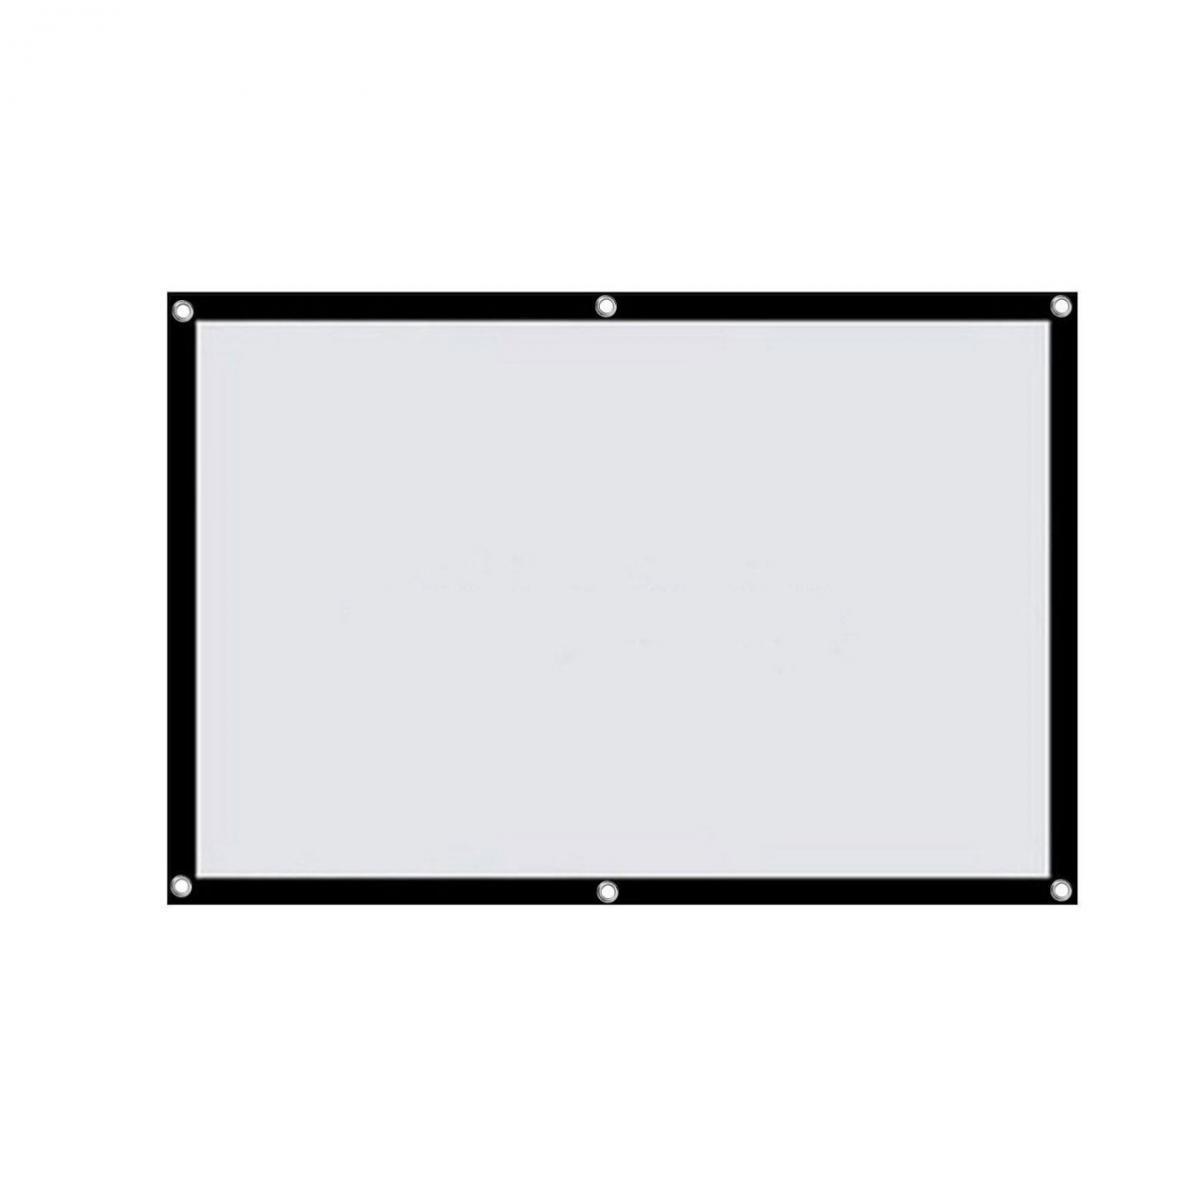 Bild 1 von LA VAGUE LV-STA100RP Leinwand 16:9 100 Zoll